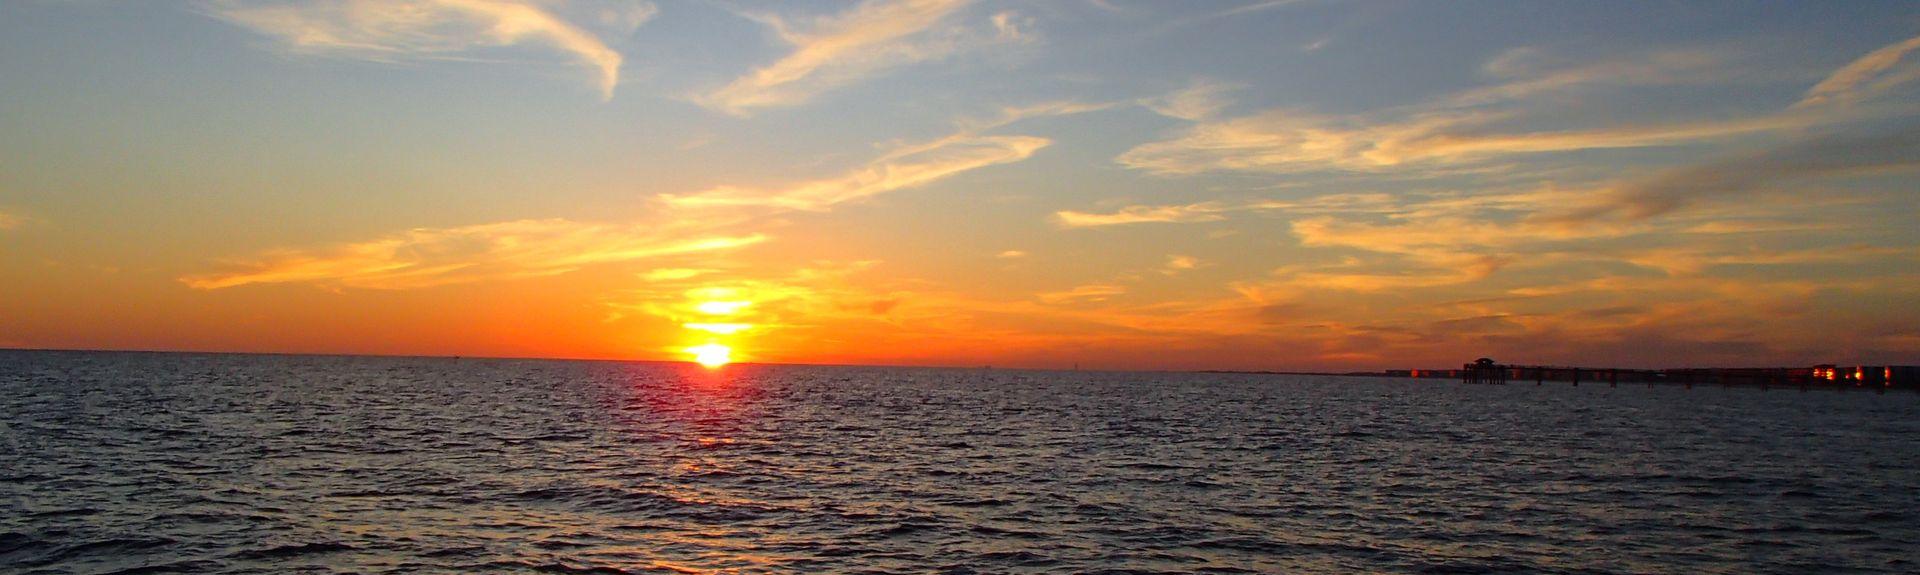 The Islander, Destin, FL, USA